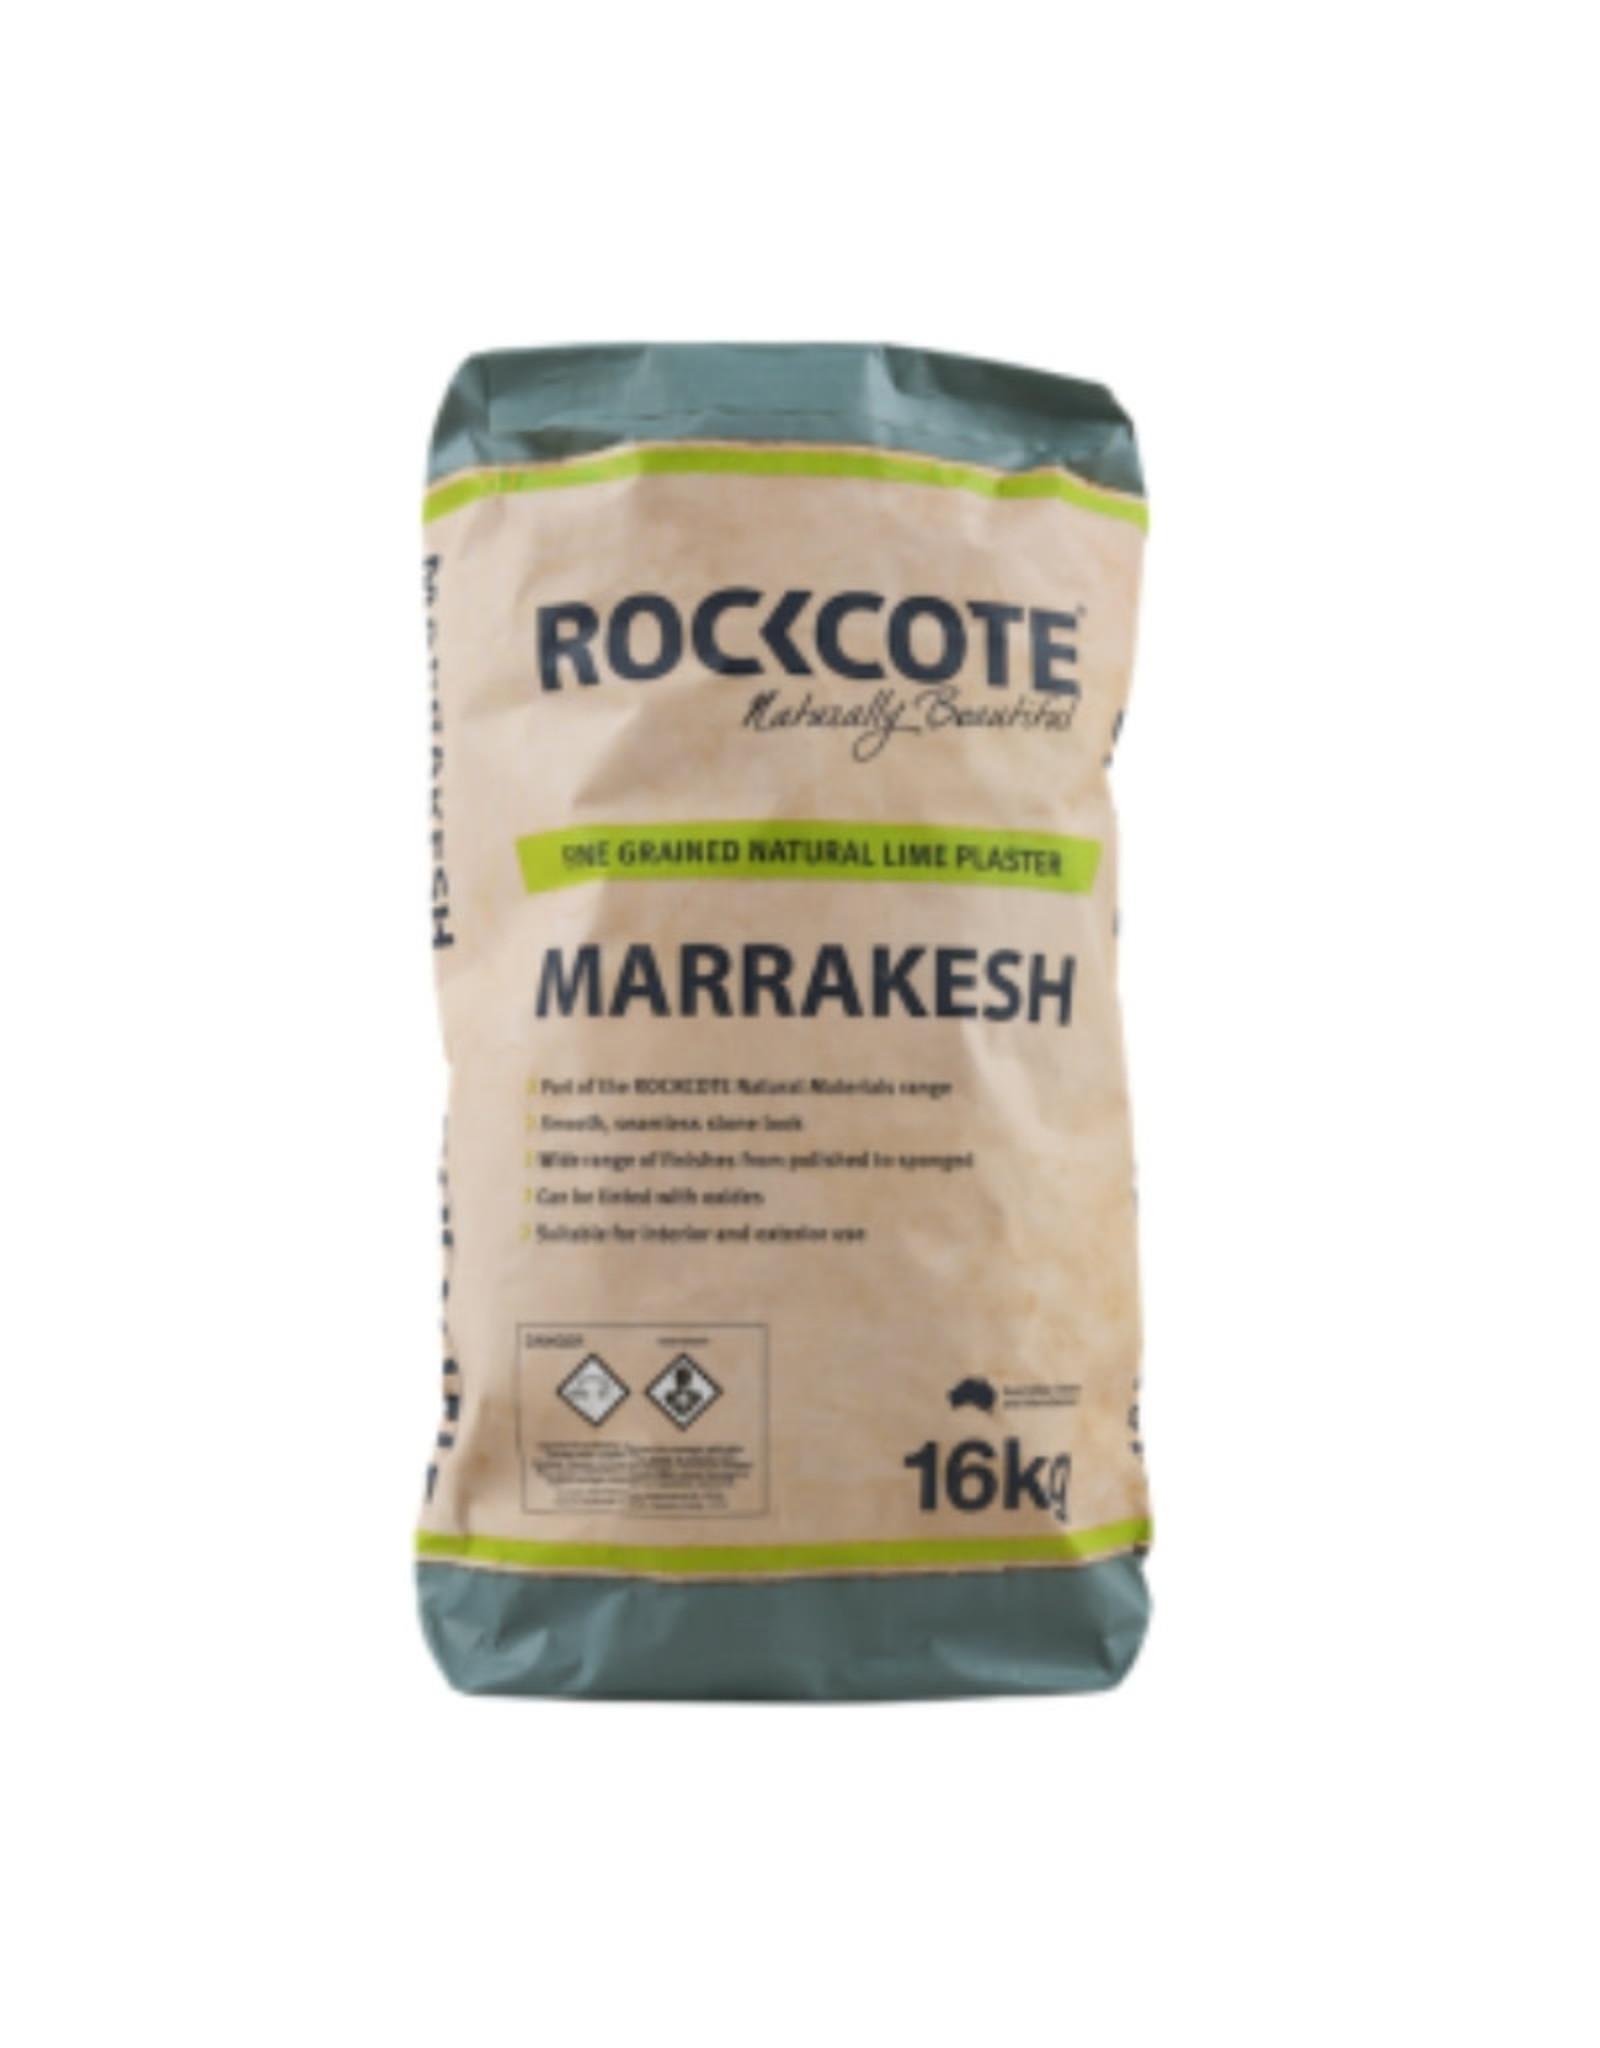 ROCKCOTE Marrakesh